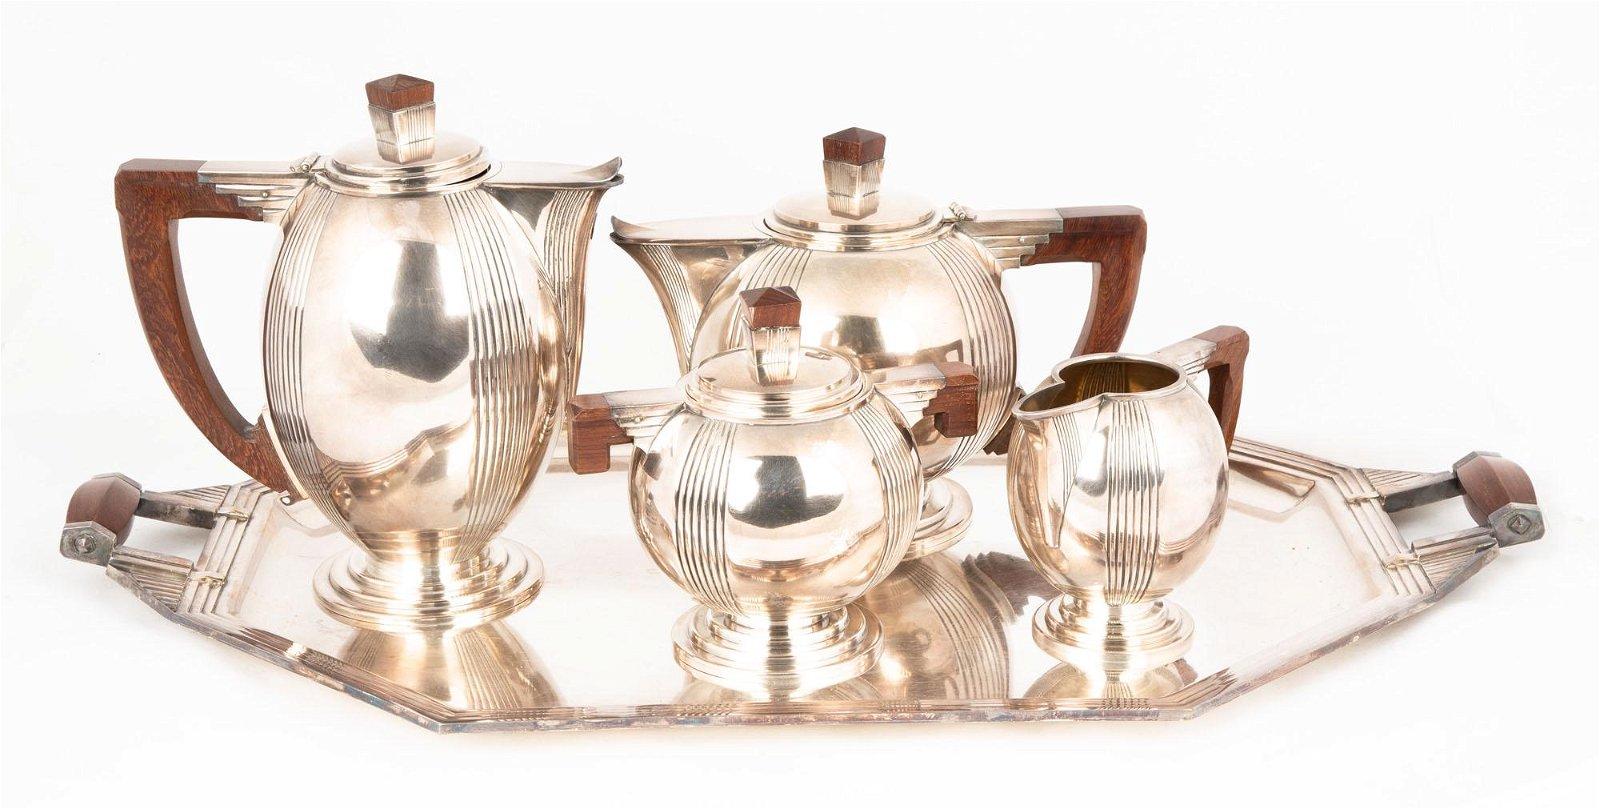 French Art Deco 5 Piece Silver Plate Tea Set